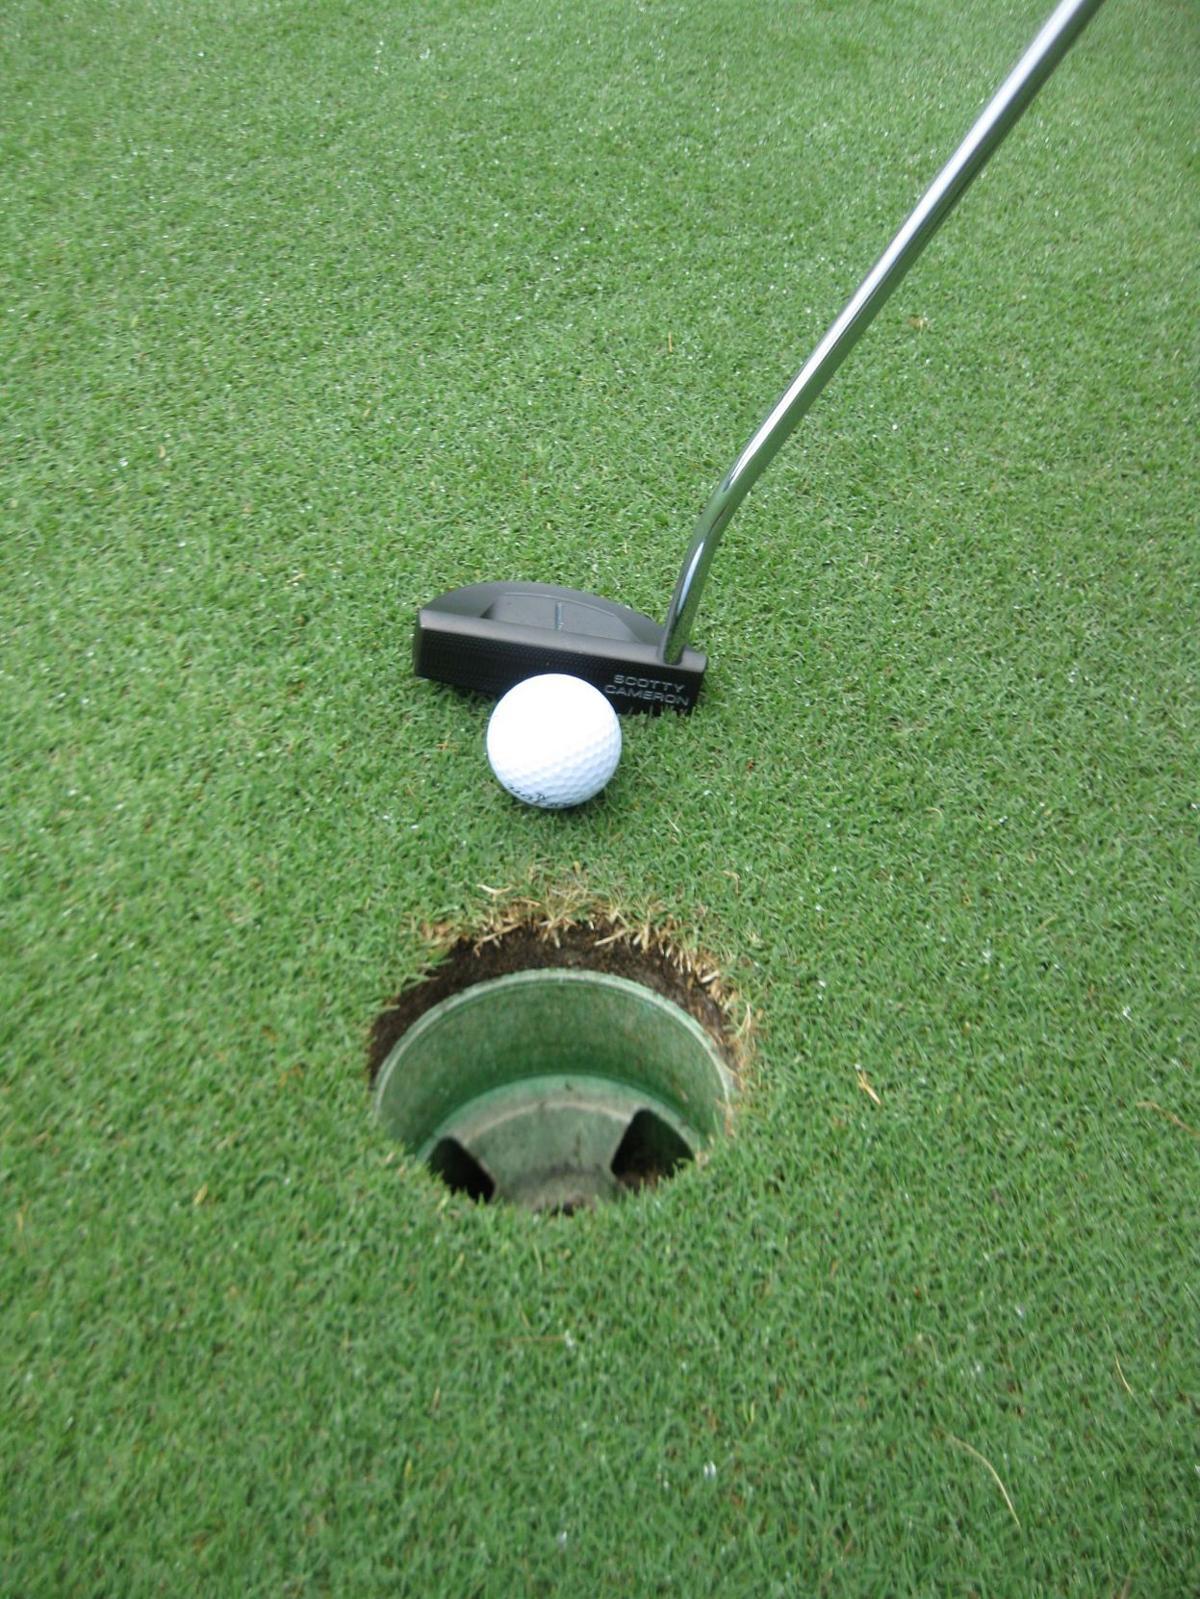 April 10 Golf Calendar and Aces